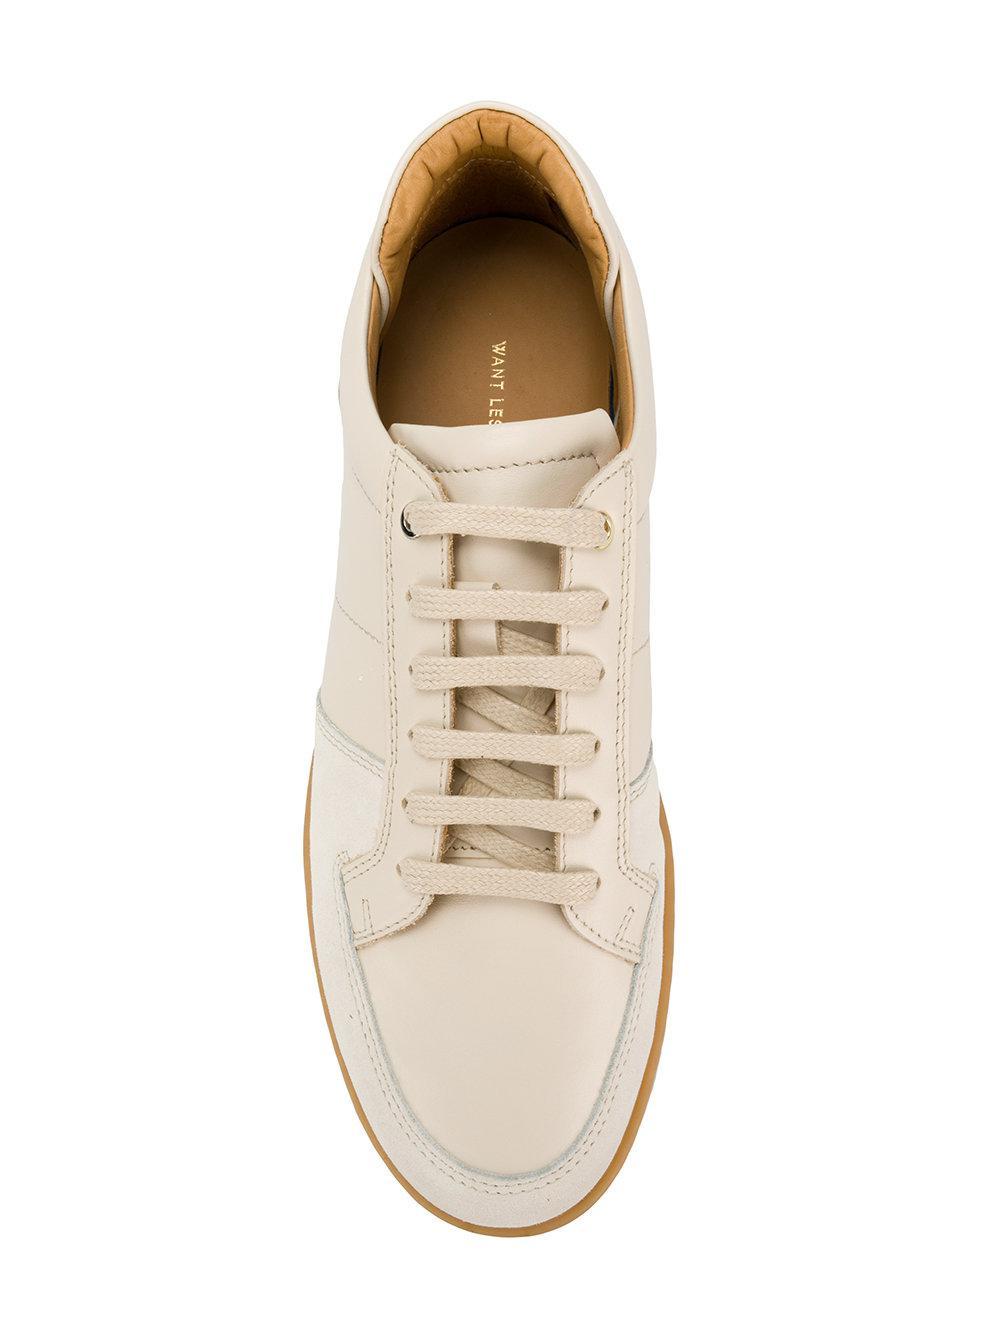 Lydd sneakers - Nude & Neutrals Les Essentiels nvQMe4hDXK